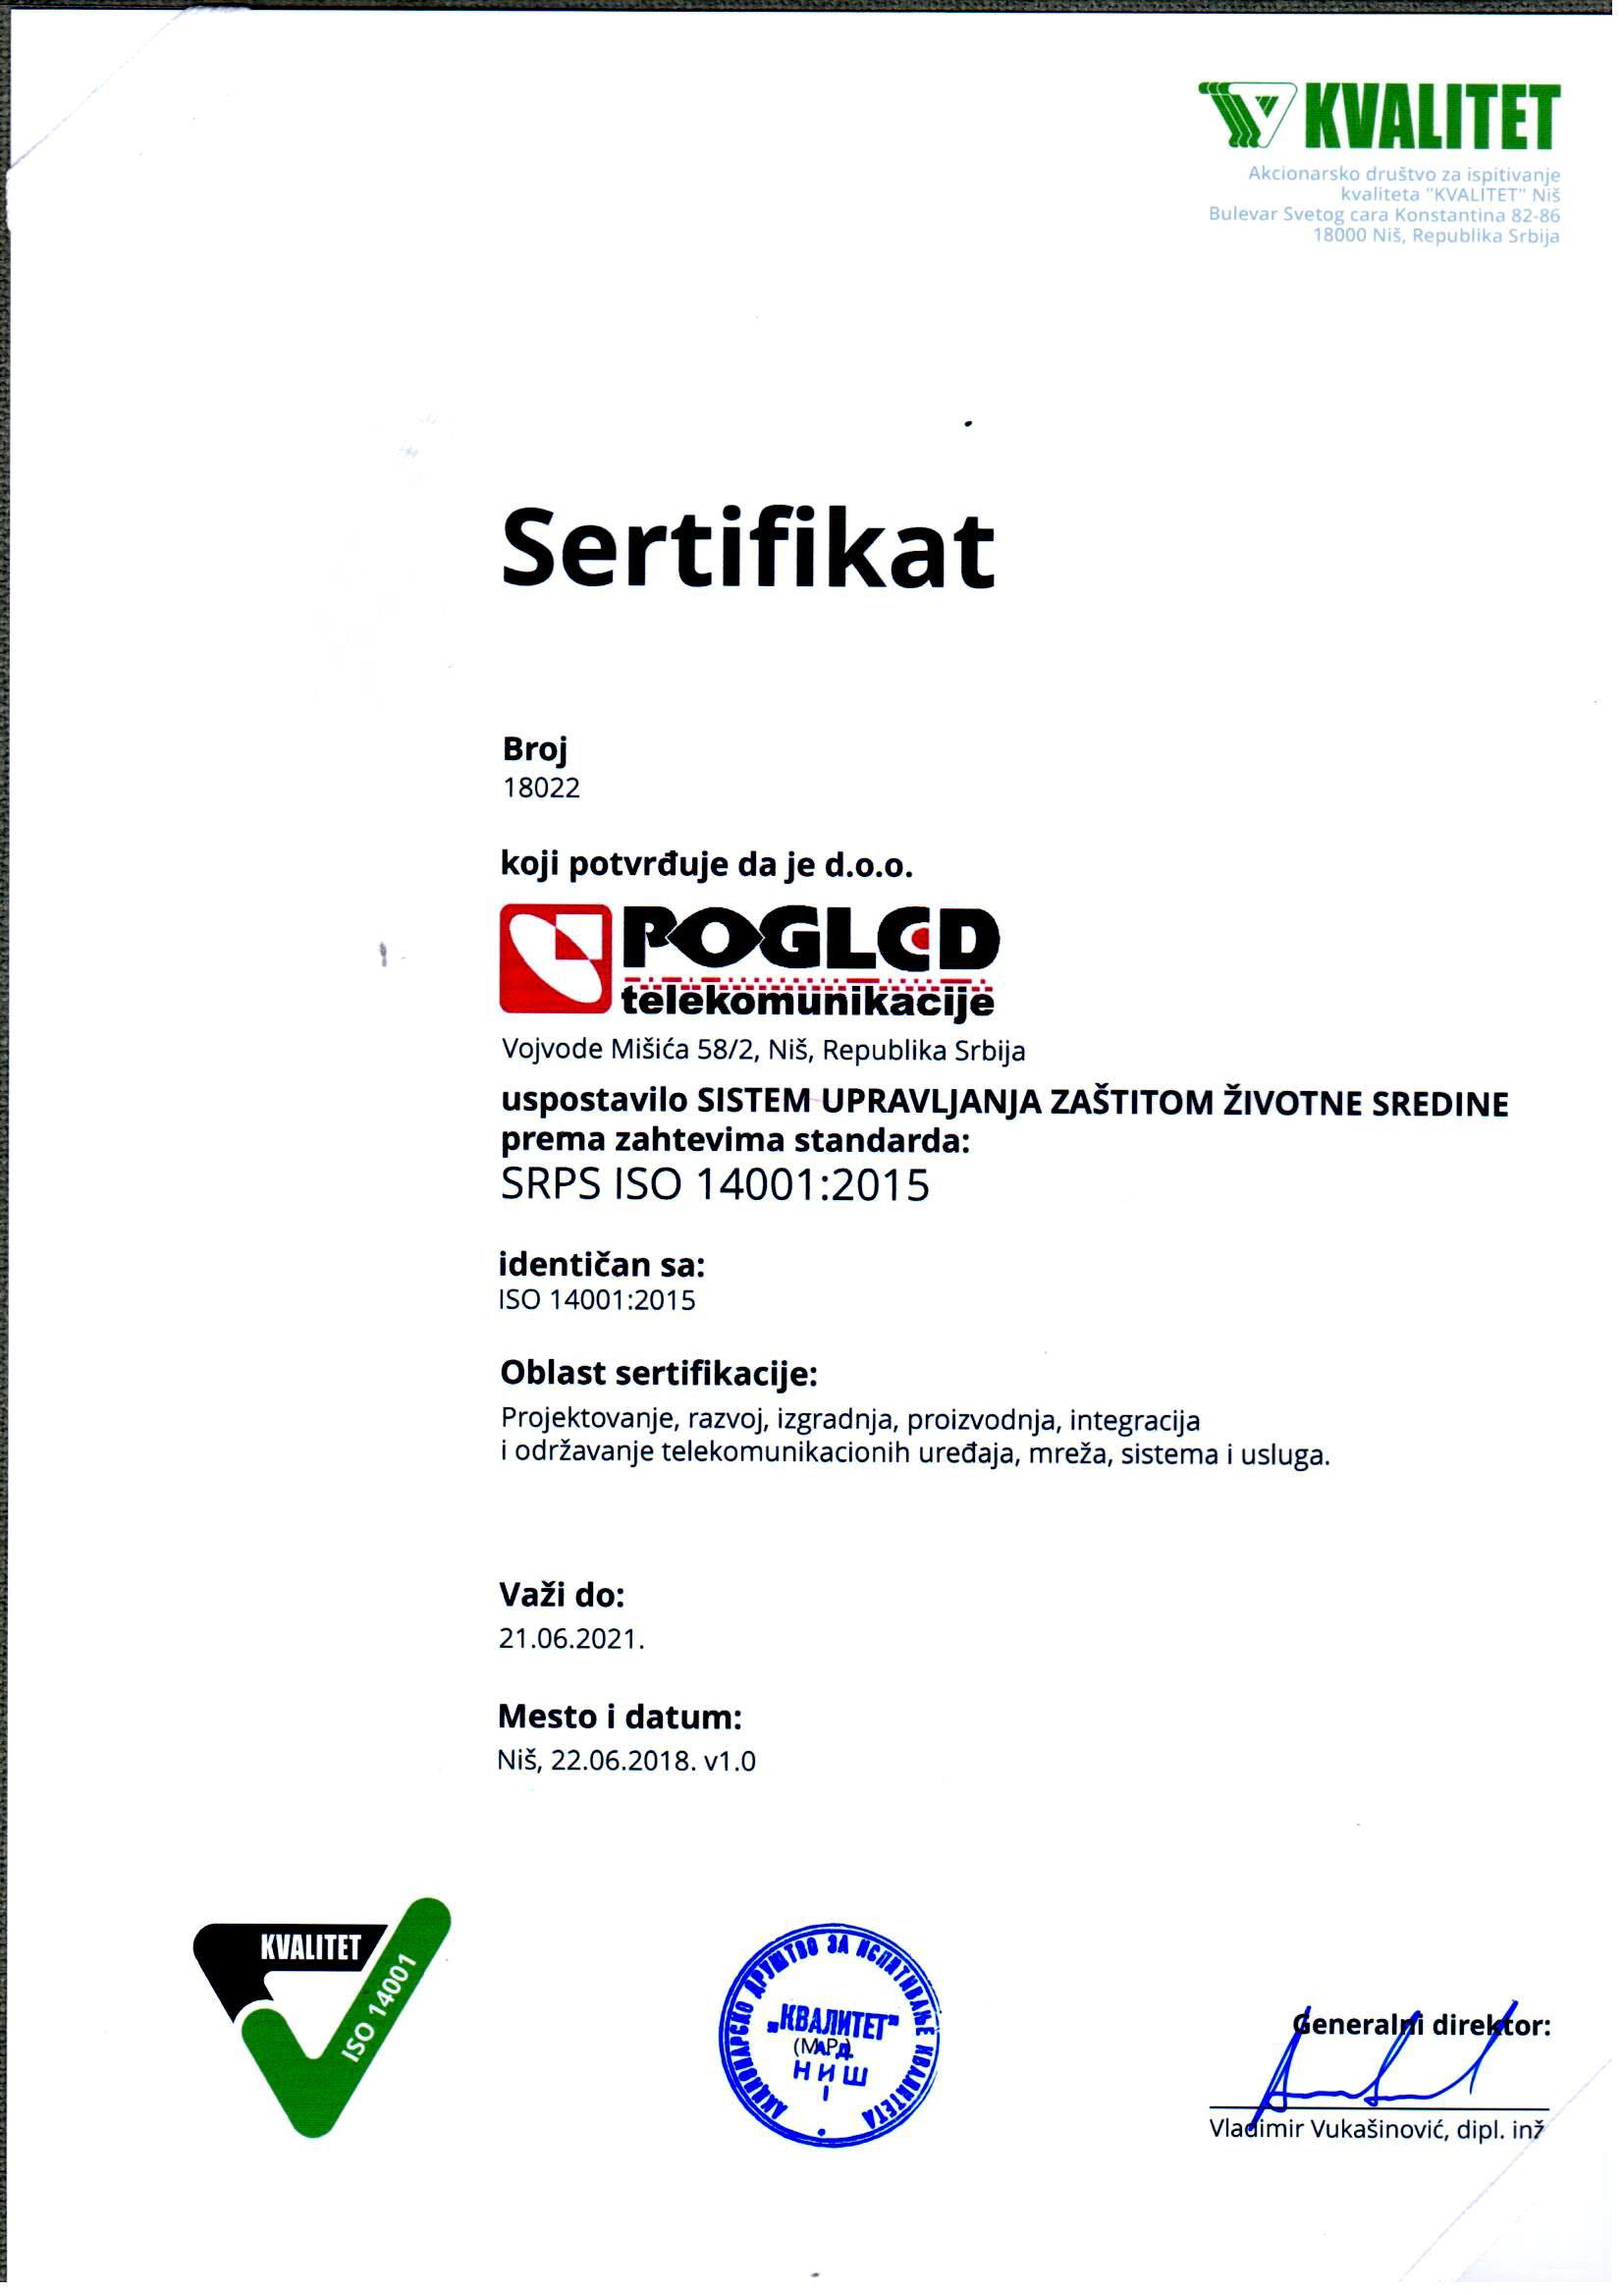 Sertifikat-ISO14001.jpg